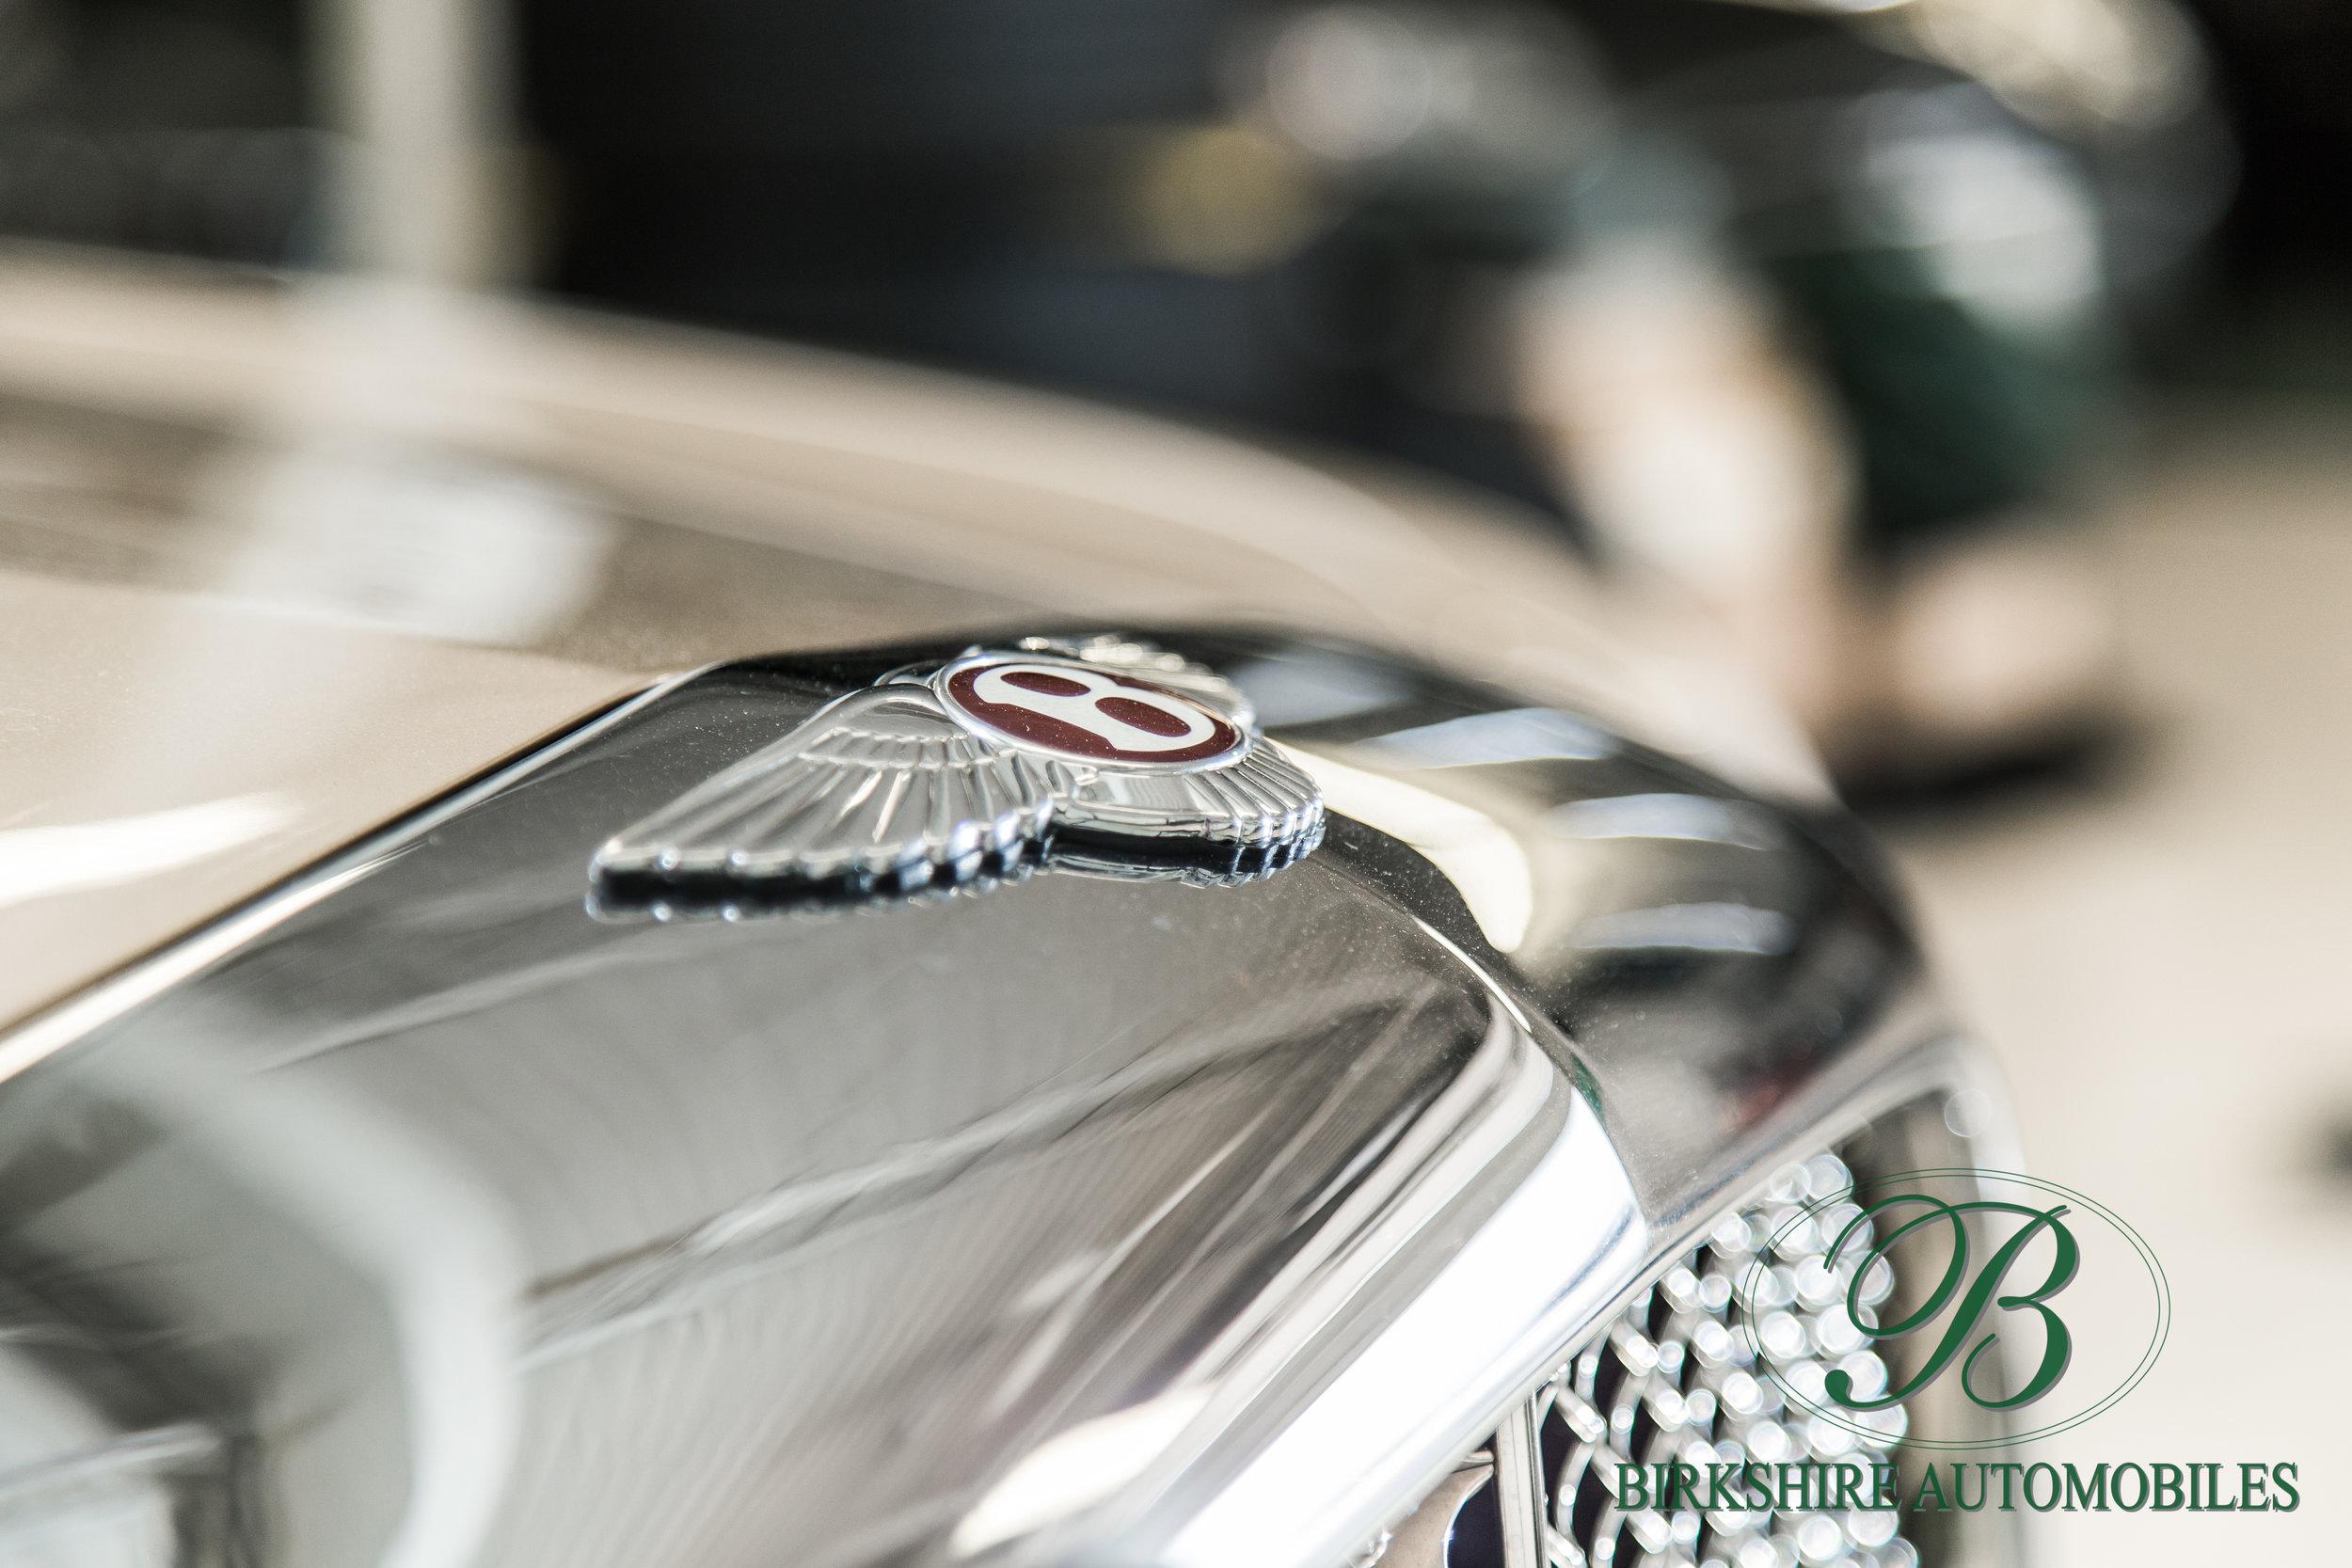 Birkshire Automobiles-331.jpg